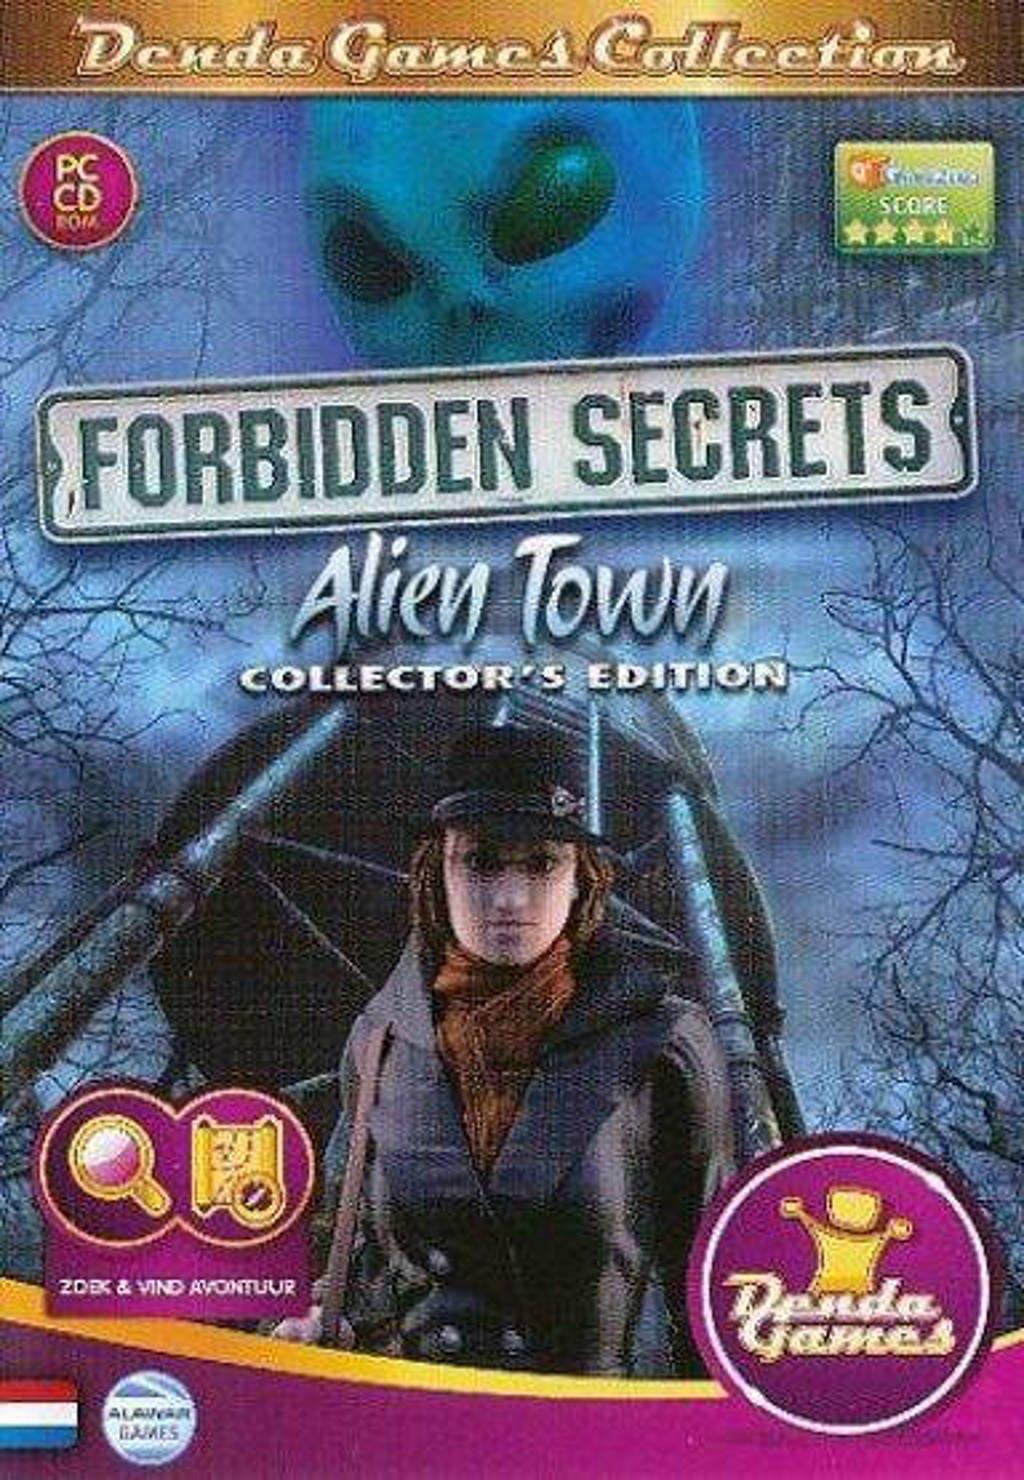 Forbidden secrets - Alien town (Collectors edition) (PC)